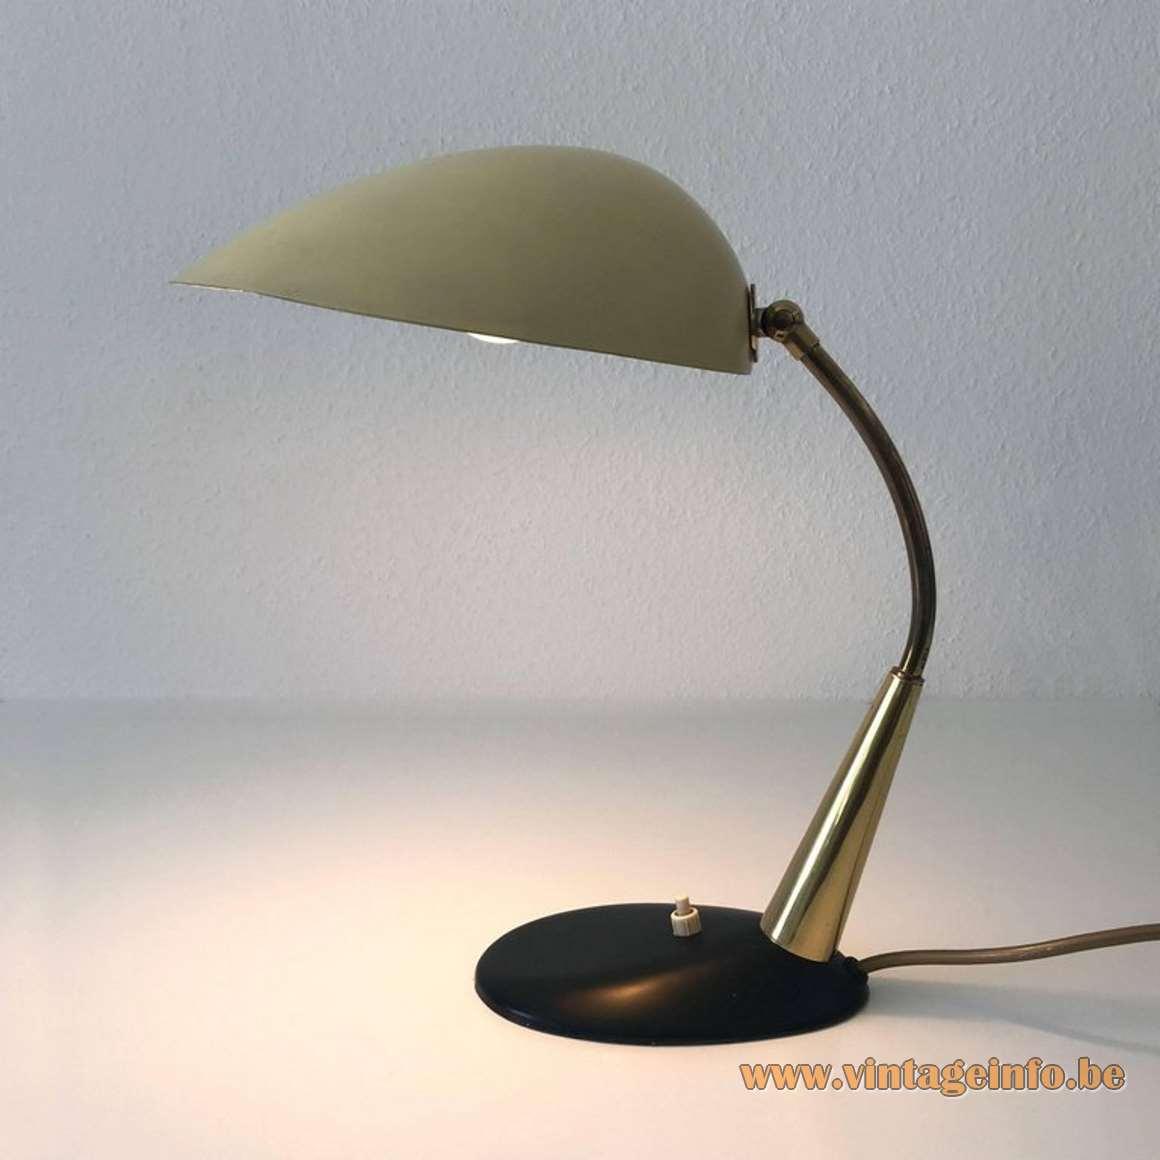 Cosack chrome gooseneck desk lamp 1950s 1960s cast iron base Gebrüder Cosack Gecos Gemany Mid-Century Modern MCM